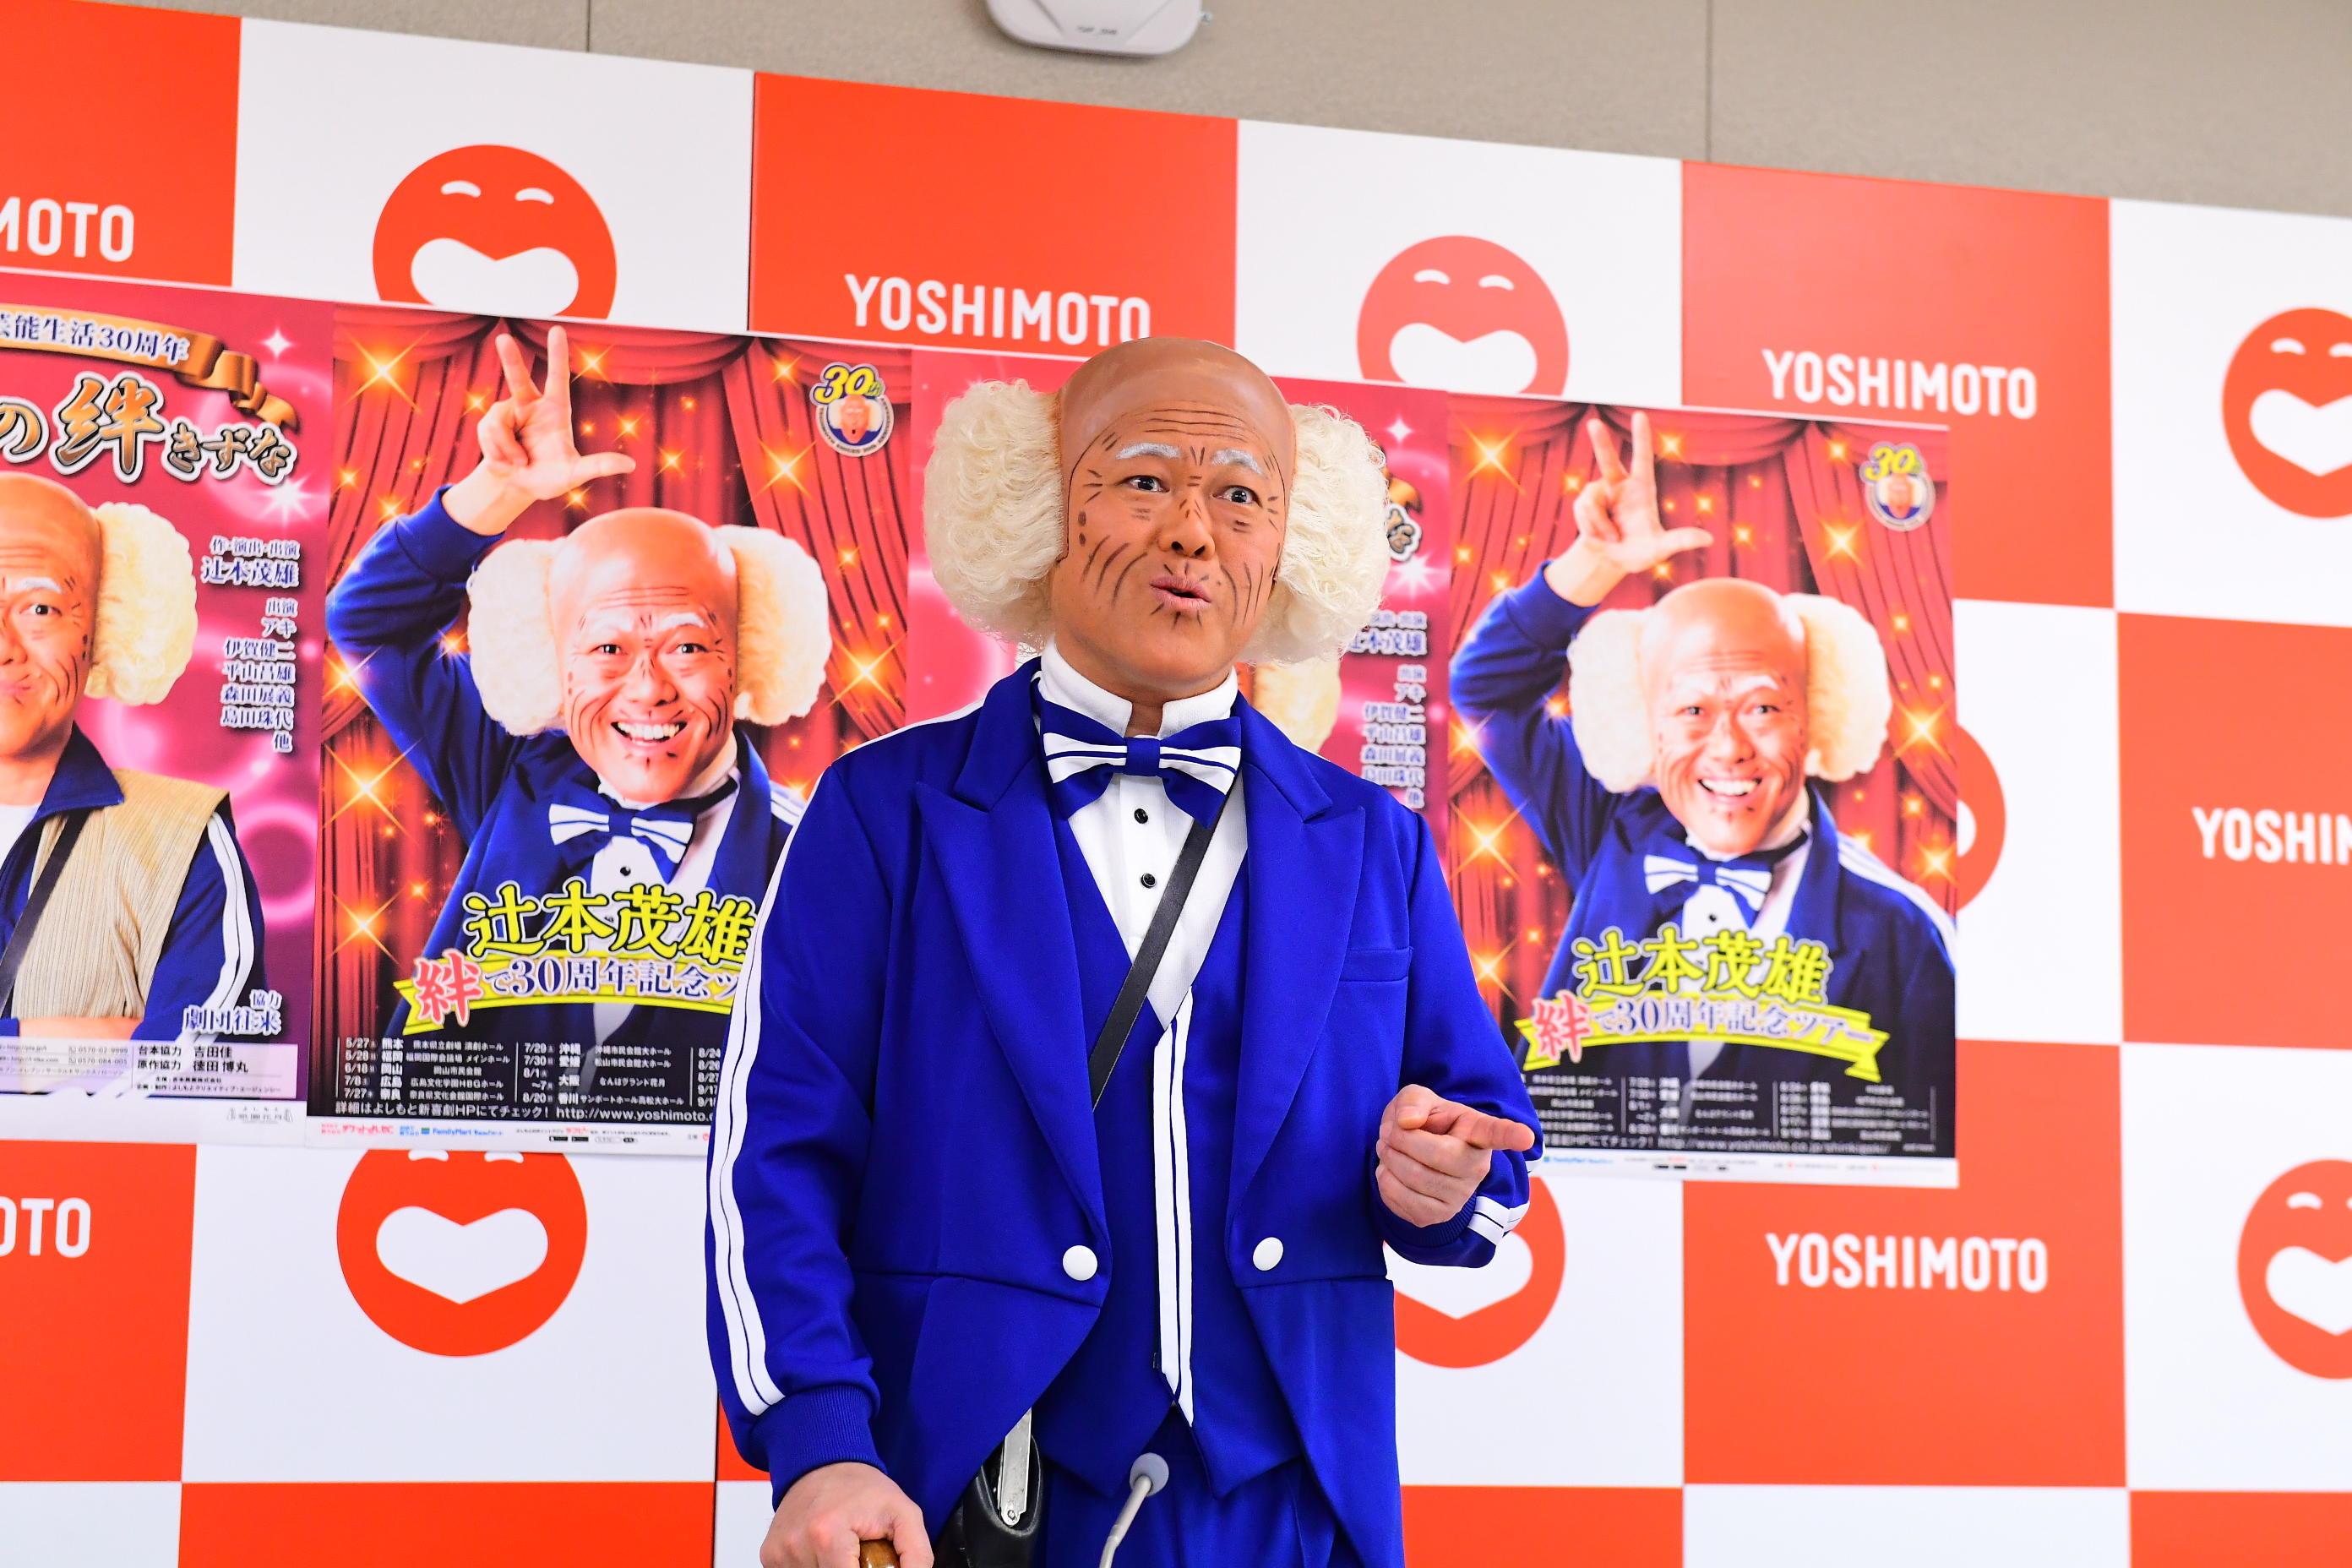 http://news.yoshimoto.co.jp/20170131181912-b07066414b5a0c41d36e6cbc1eaf52ab24a8a33f.jpg